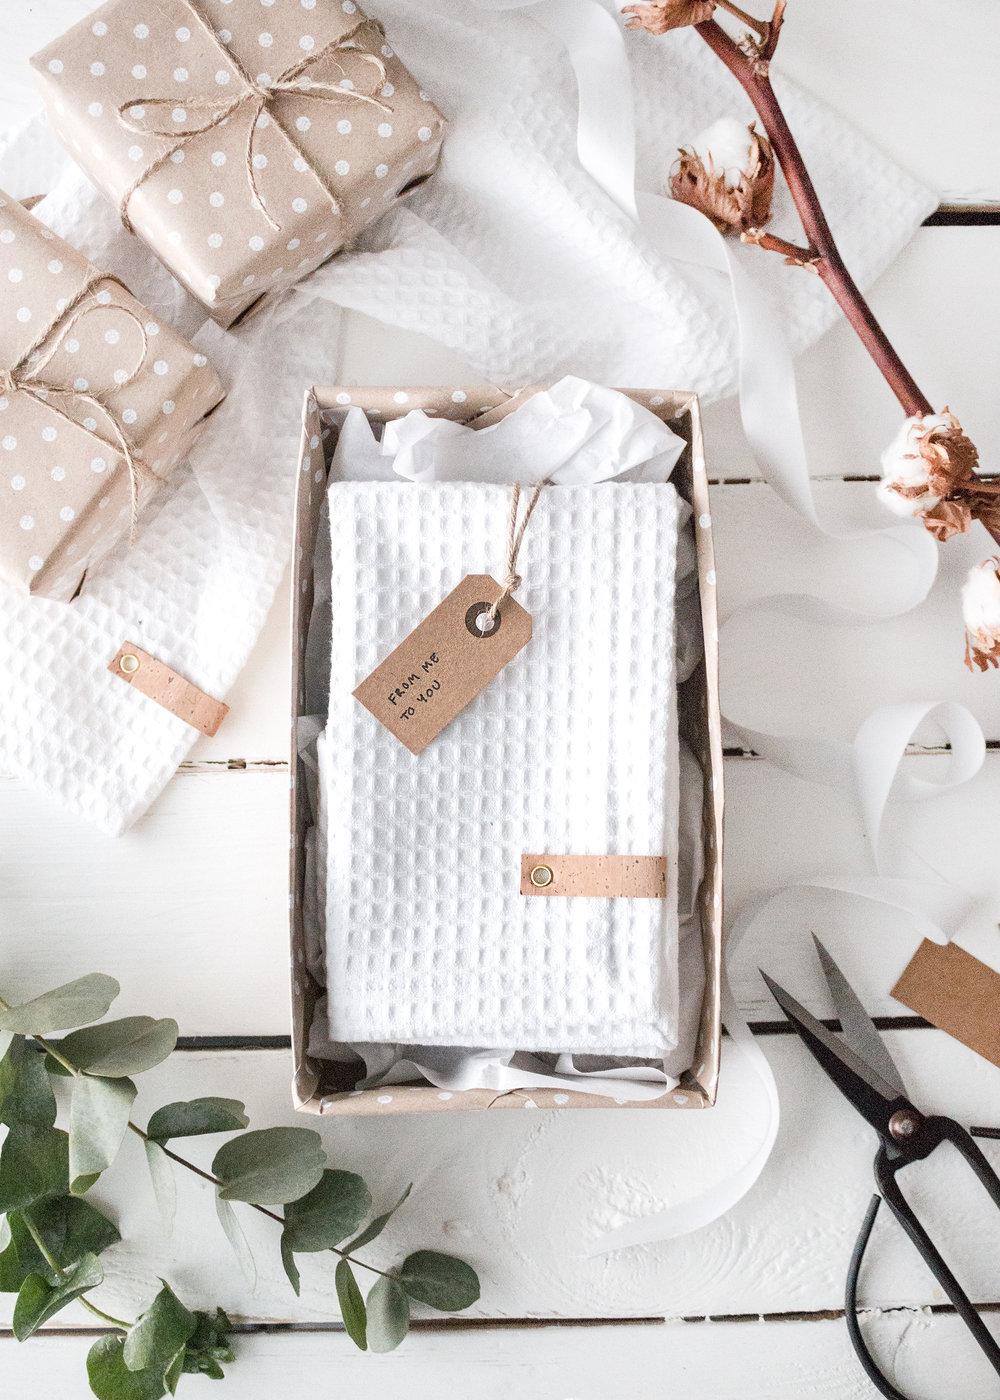 Christmas by Sandramaria X-mas gift present wrapping.jpg